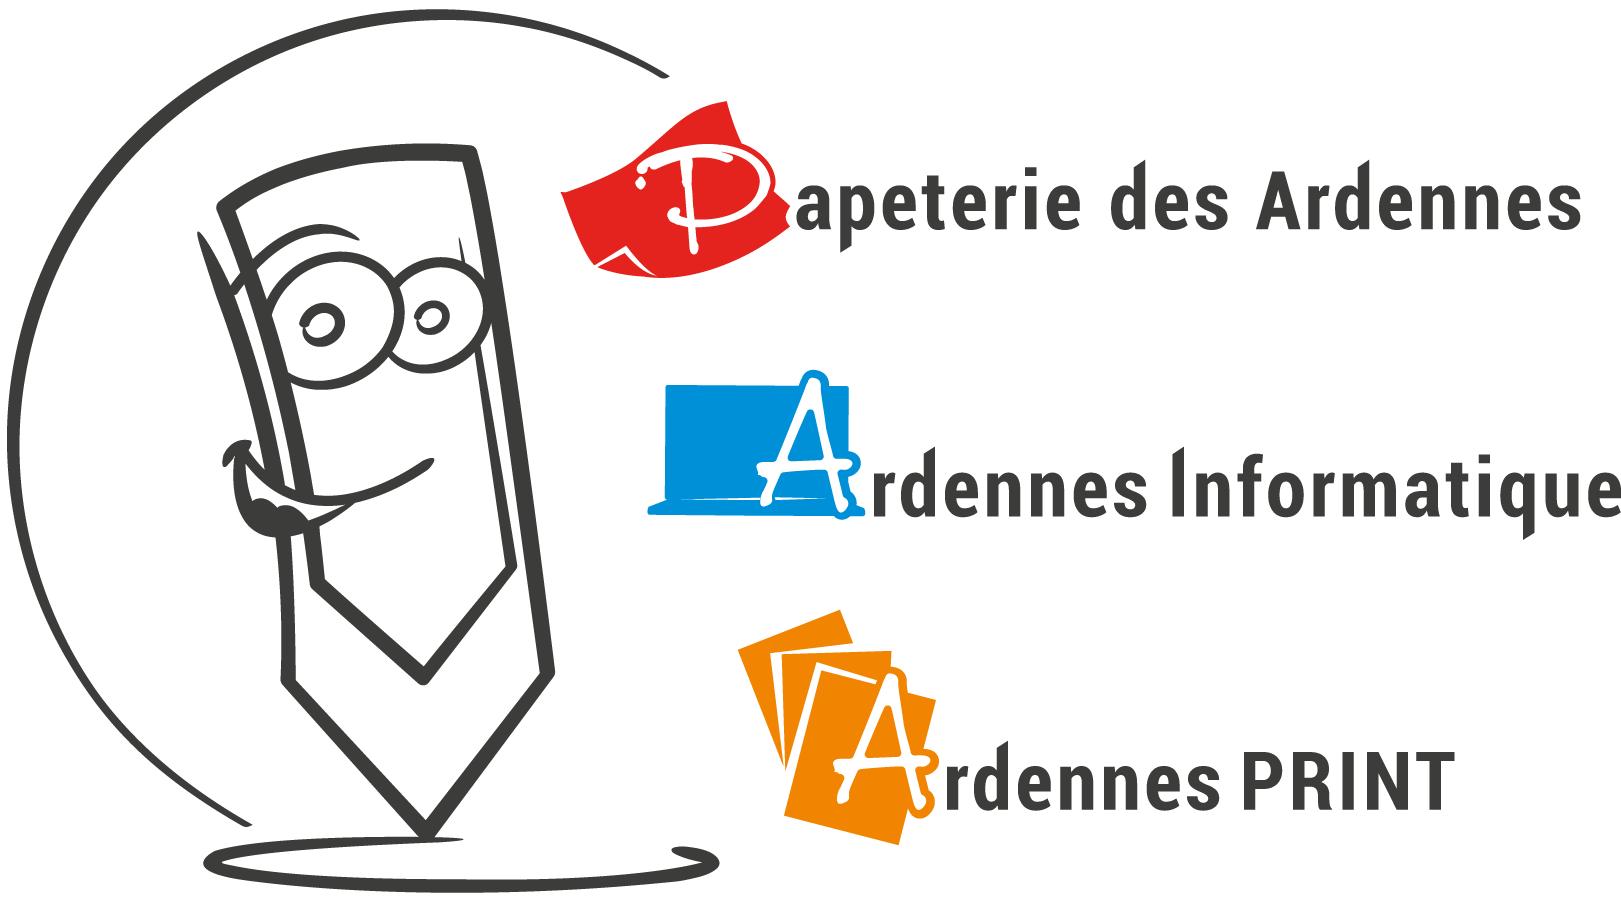 logo Papeterie des Ardennes